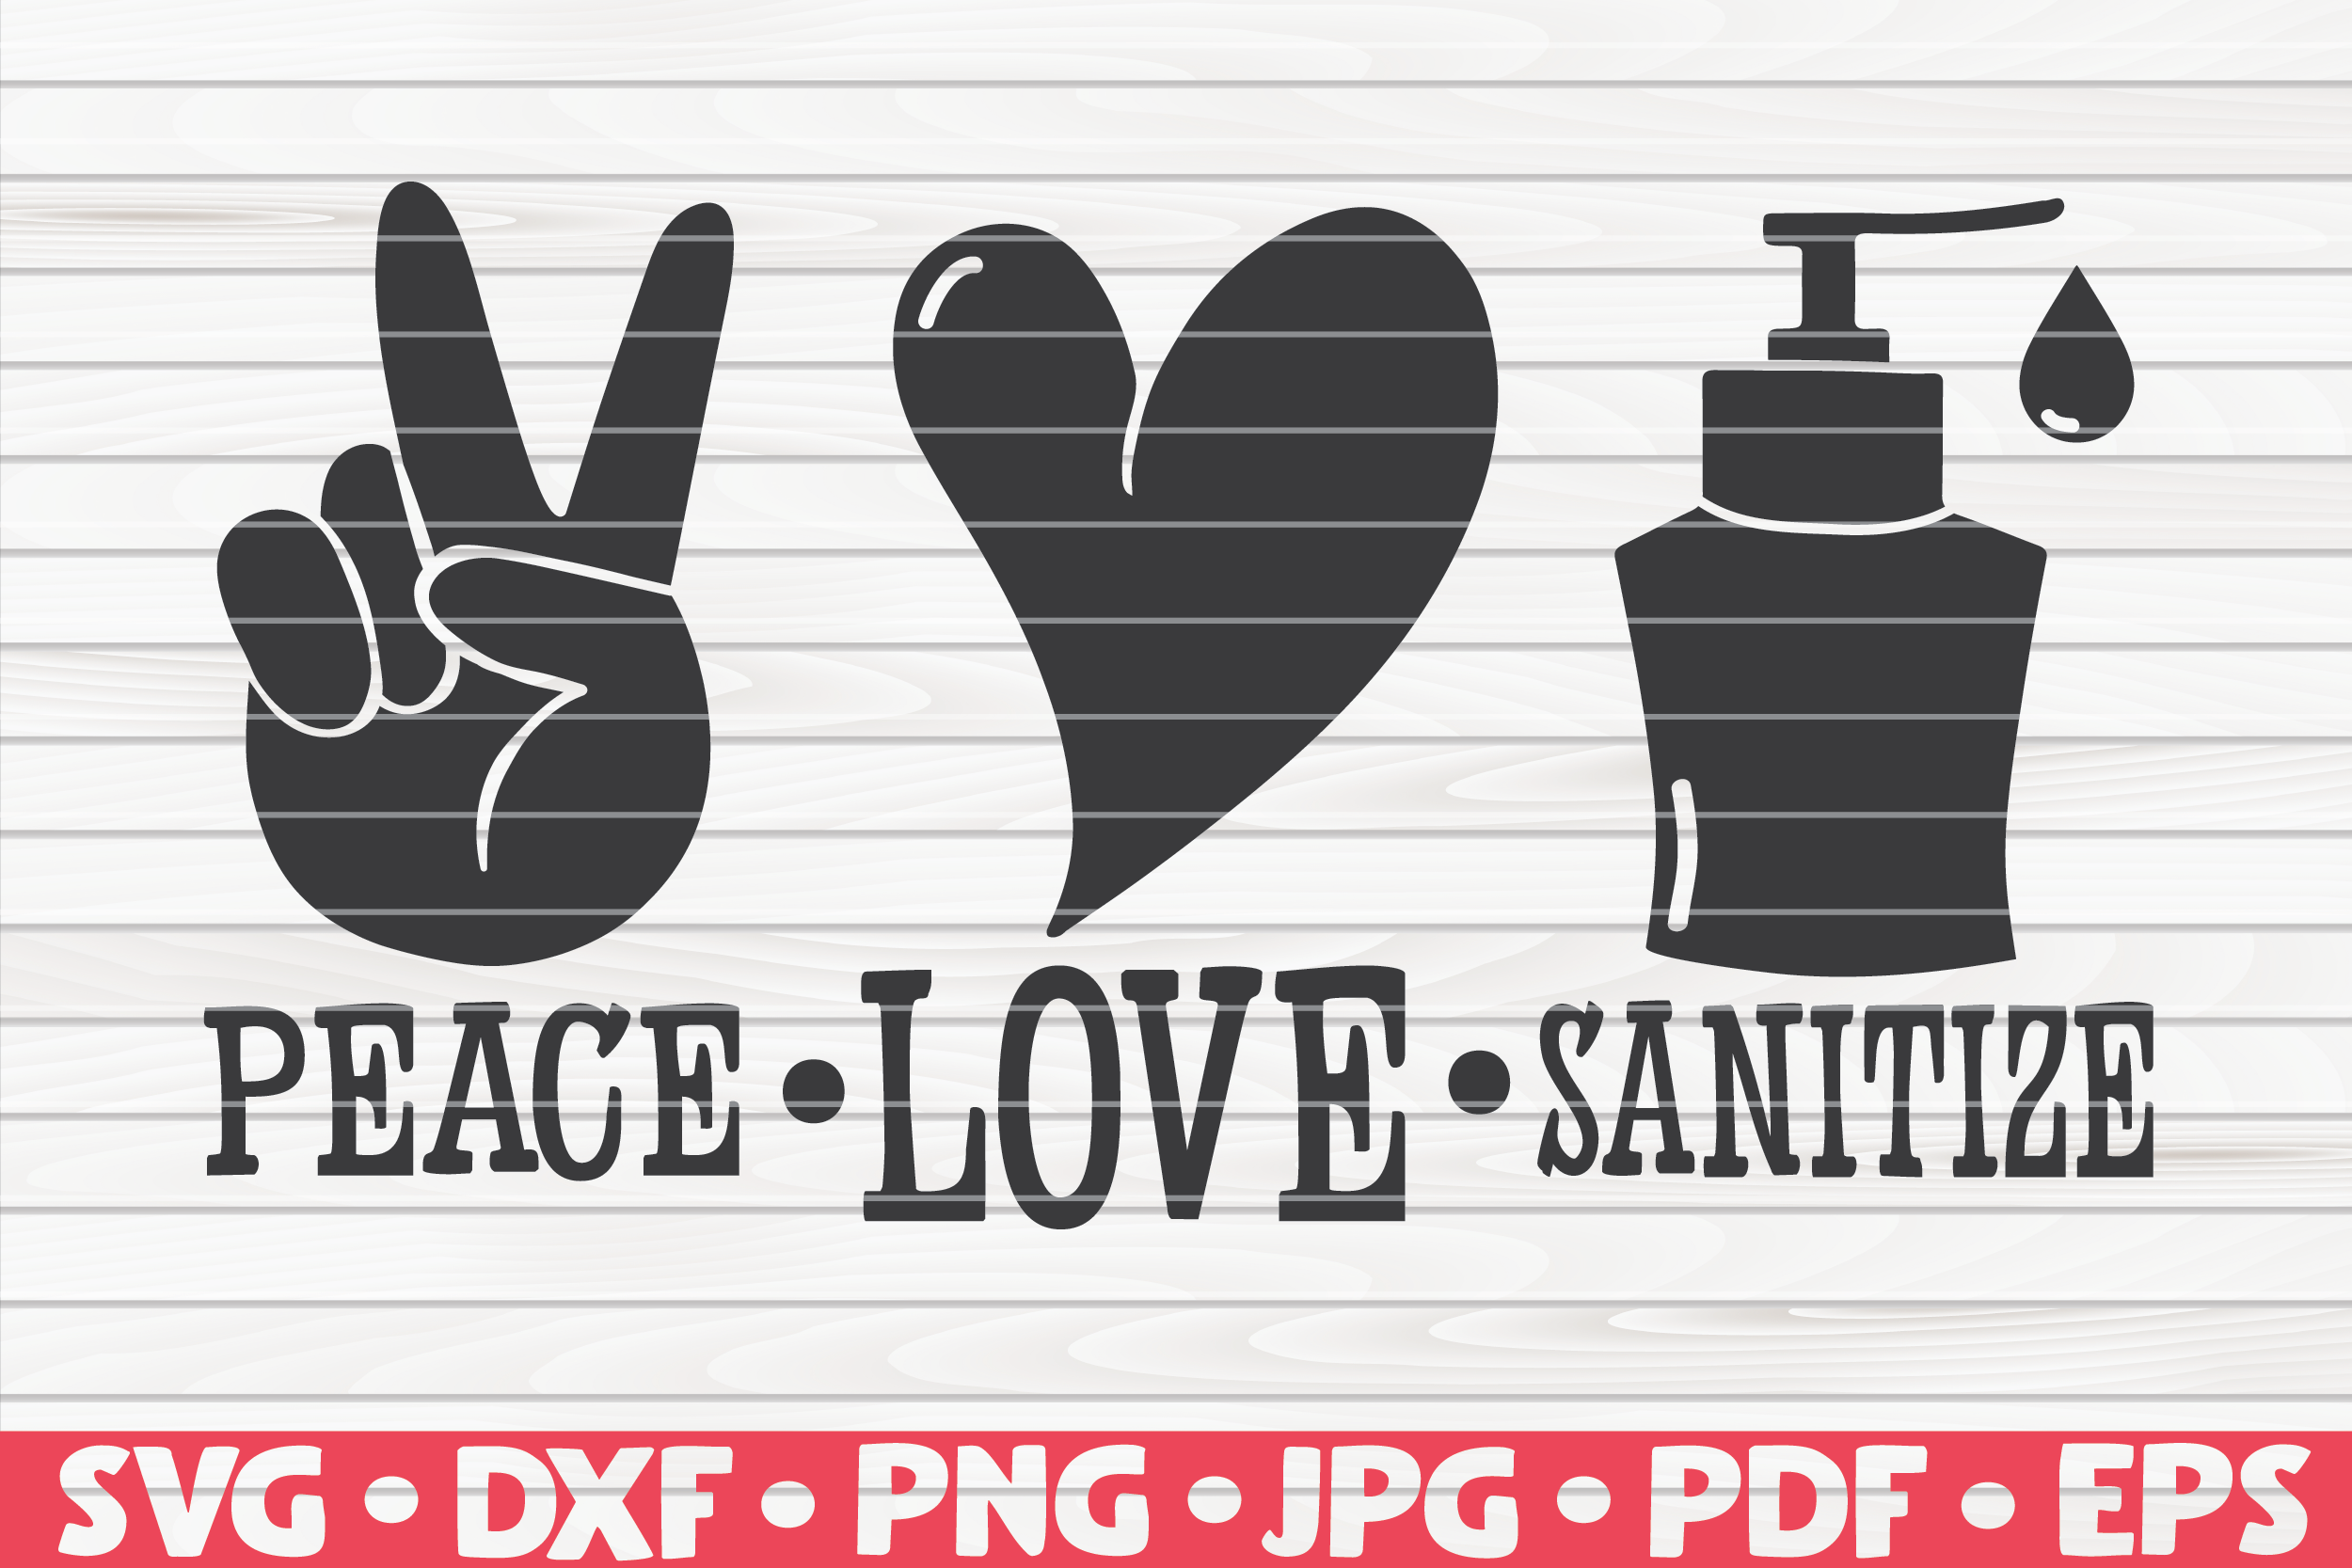 Peace Love Sanitize Svg Quarantine Social Distancing By